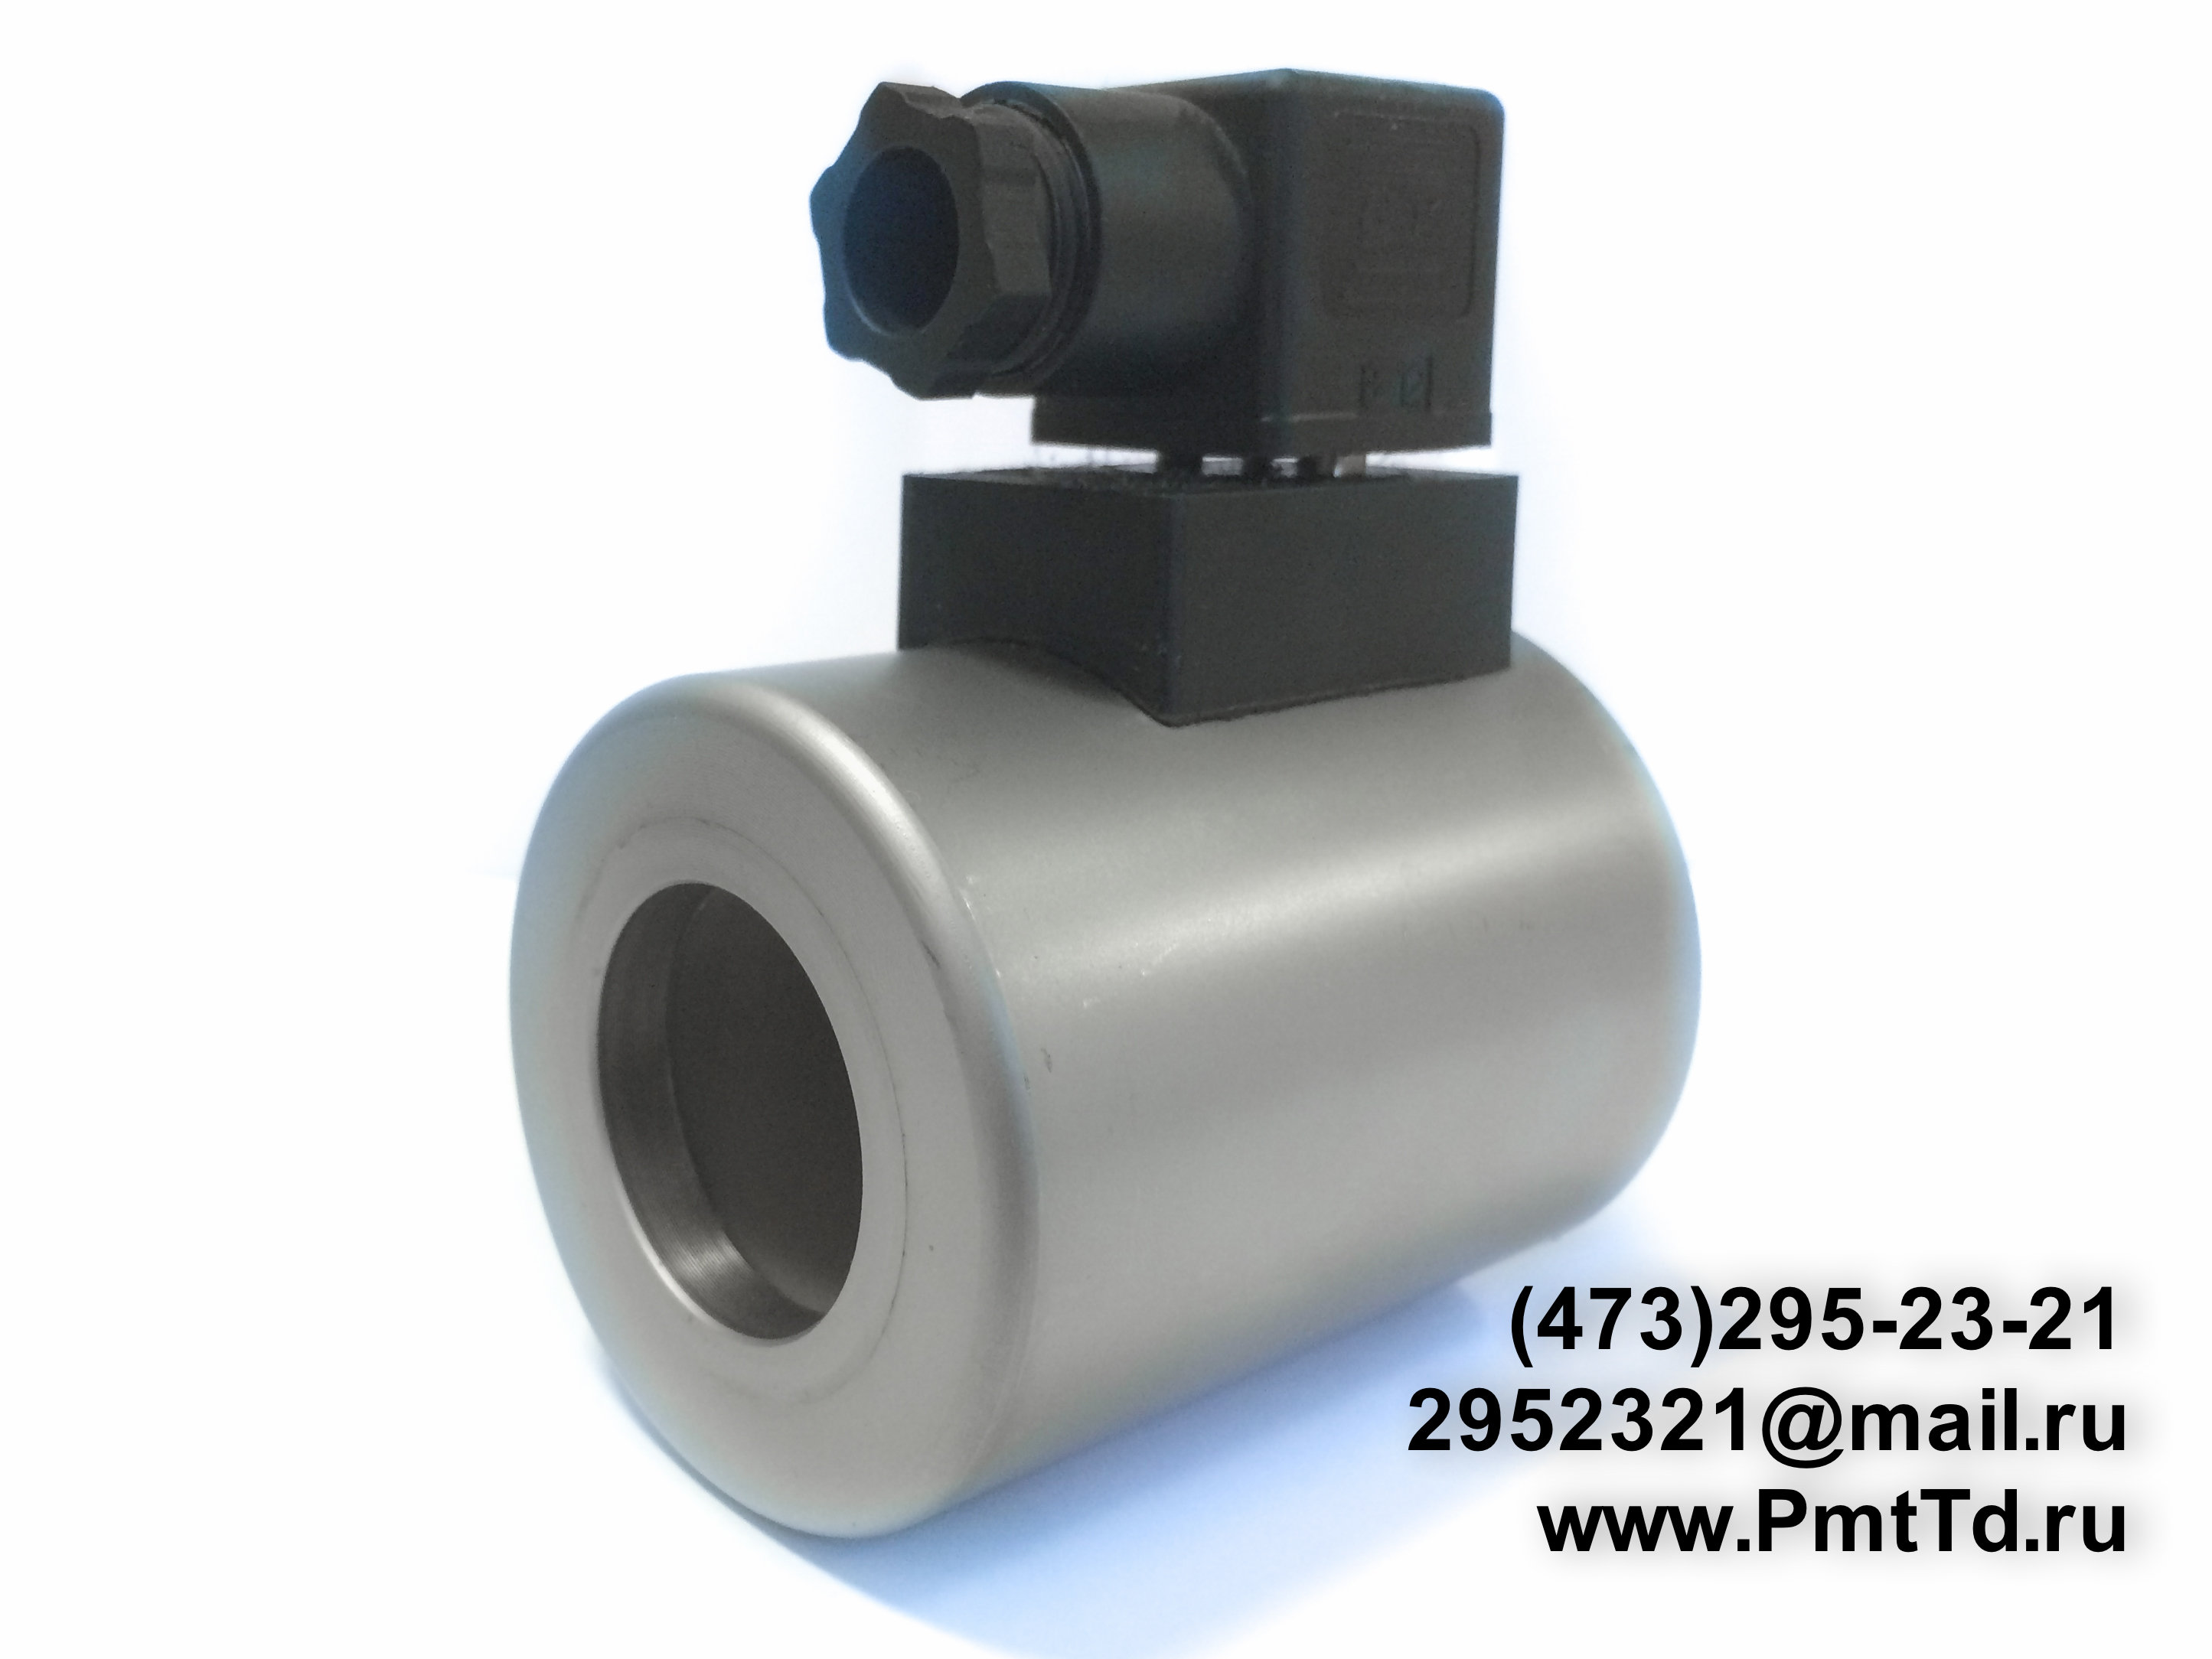 Катушка электромагнитная к гидрораспределителю MFZ10-90YC